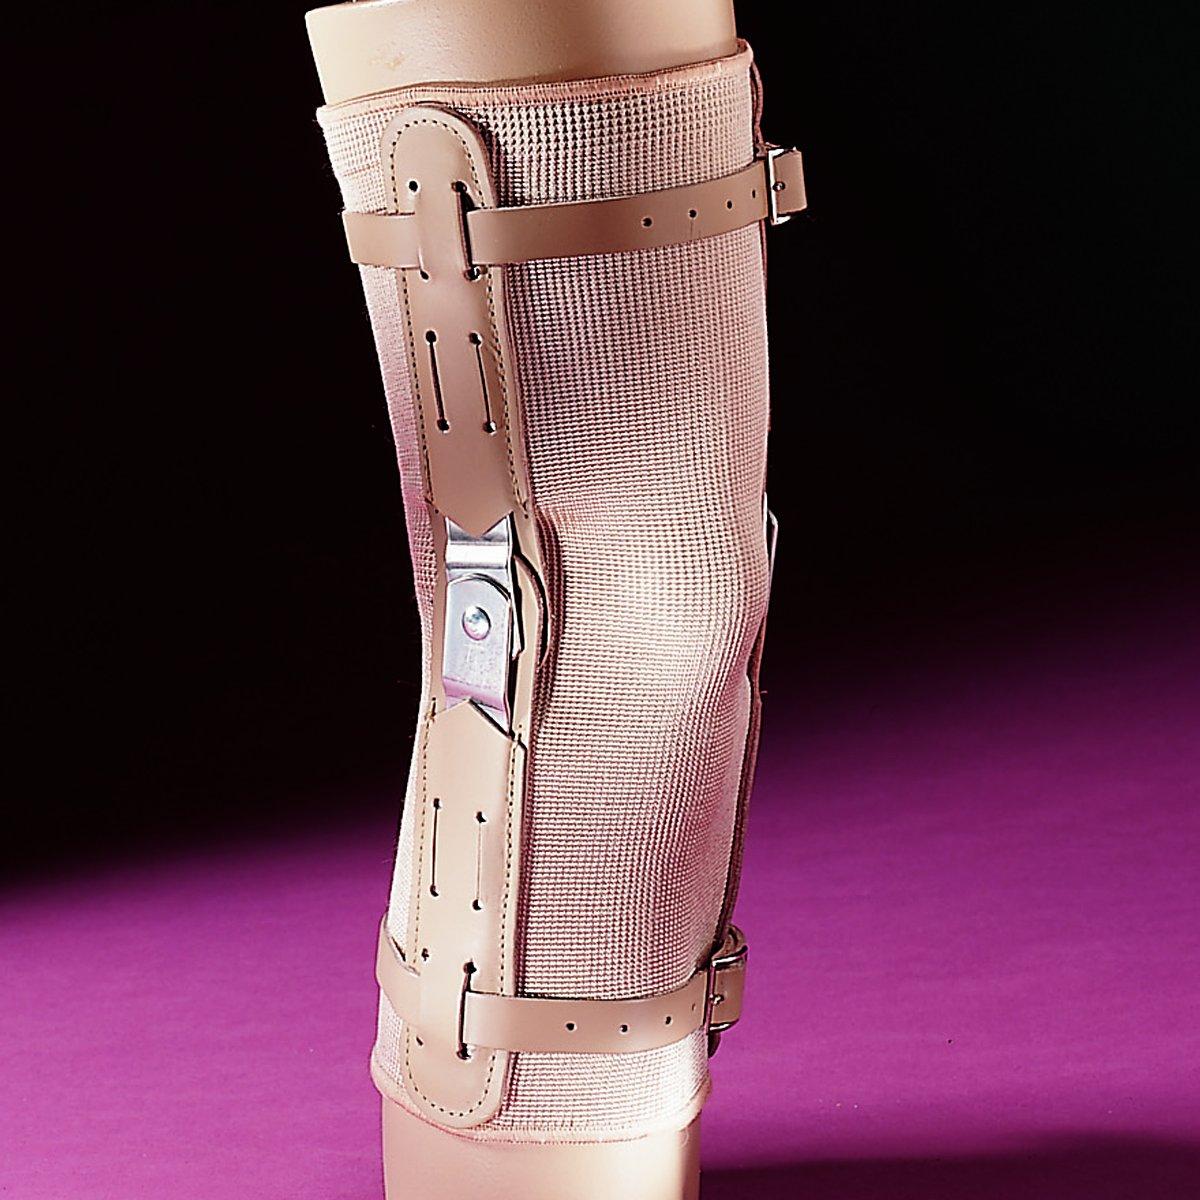 97c4863070 Amazon.com: Elastic Hinged Knee Brace Support Closed Patella 856 (S):  Health & Personal Care